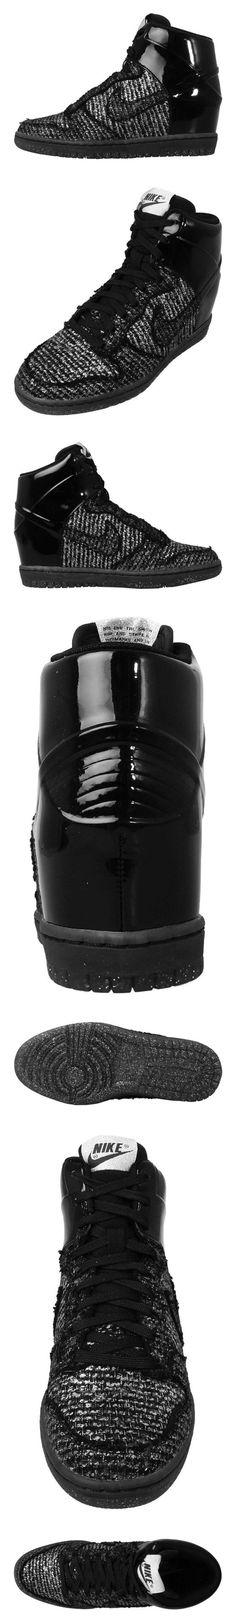 $219.95 - Nike Dunk Sky HI VT QS Womens Basketball Shoes 611908-001 Black Metallic Silver 8 M US #shoes #nike #2015